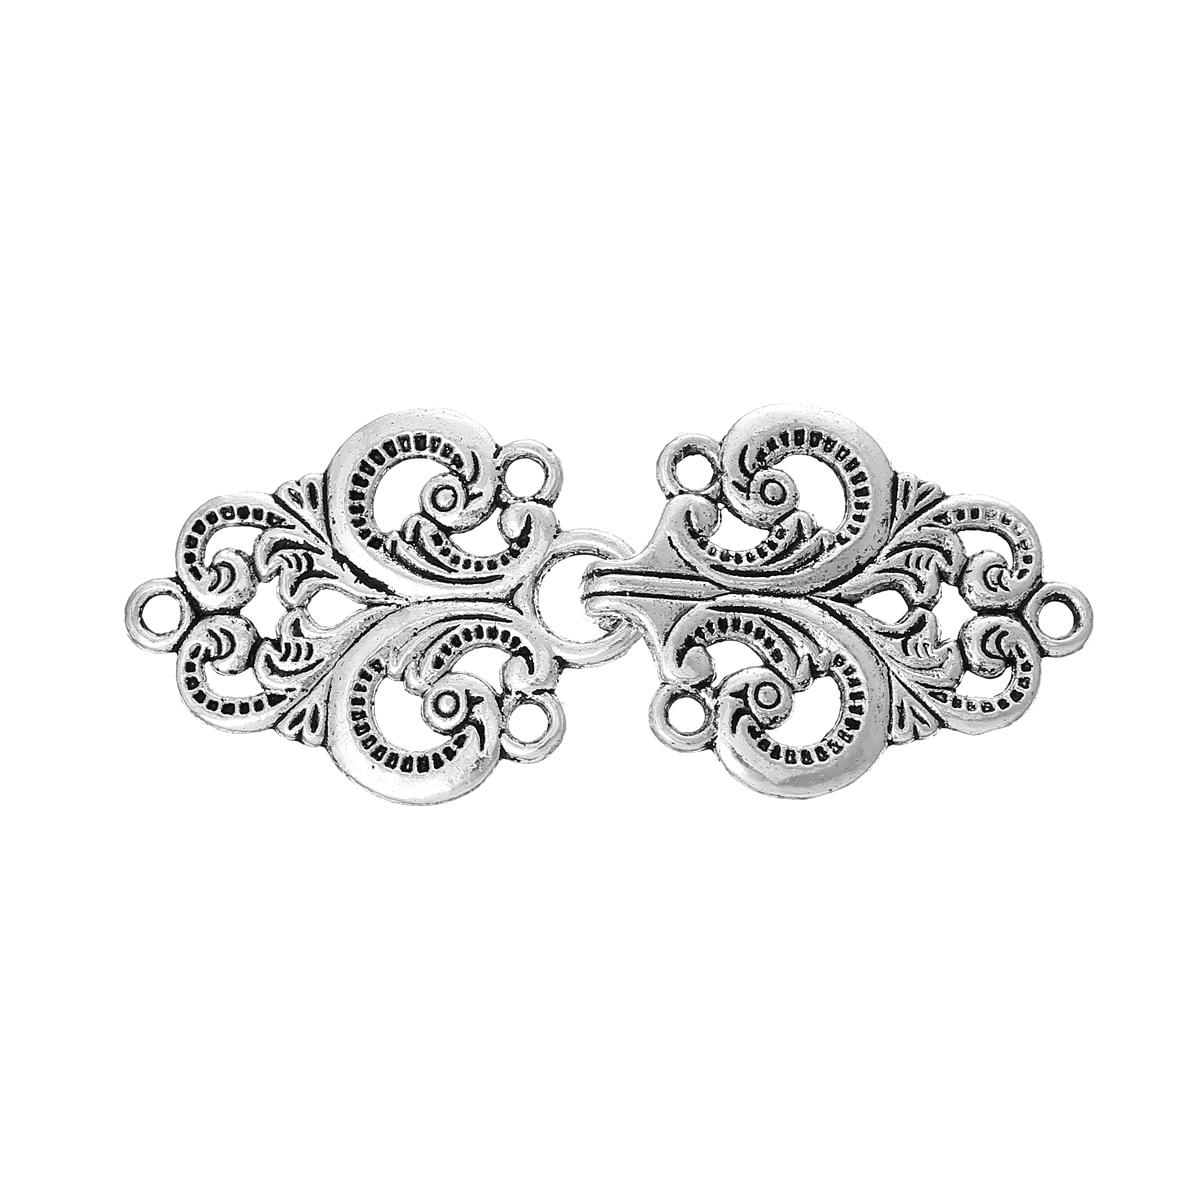 DoreenBeads Zinc Metal Alloy Toggle Clasps Rhombus Antique Silver Pattern Pattern 6.7cm X2.8cm(2 5/8